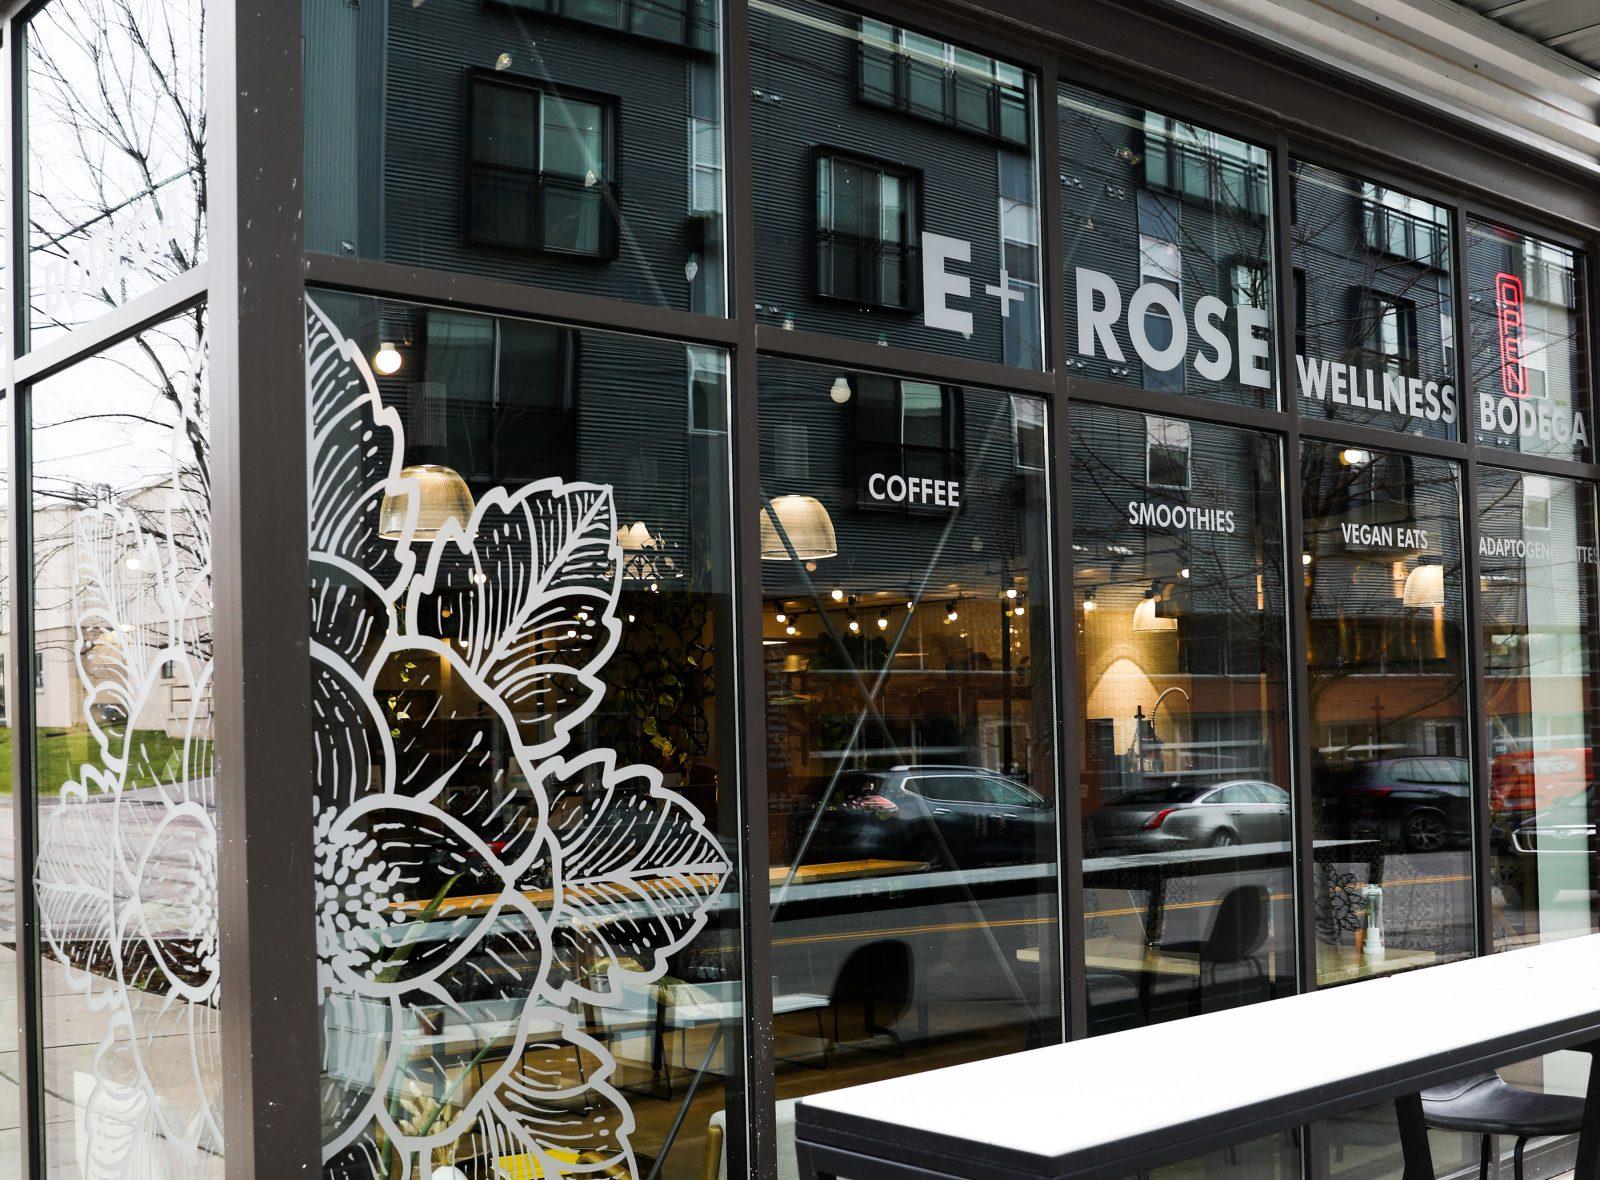 E+Rose Wellness cafe in Wedgewood-Houston